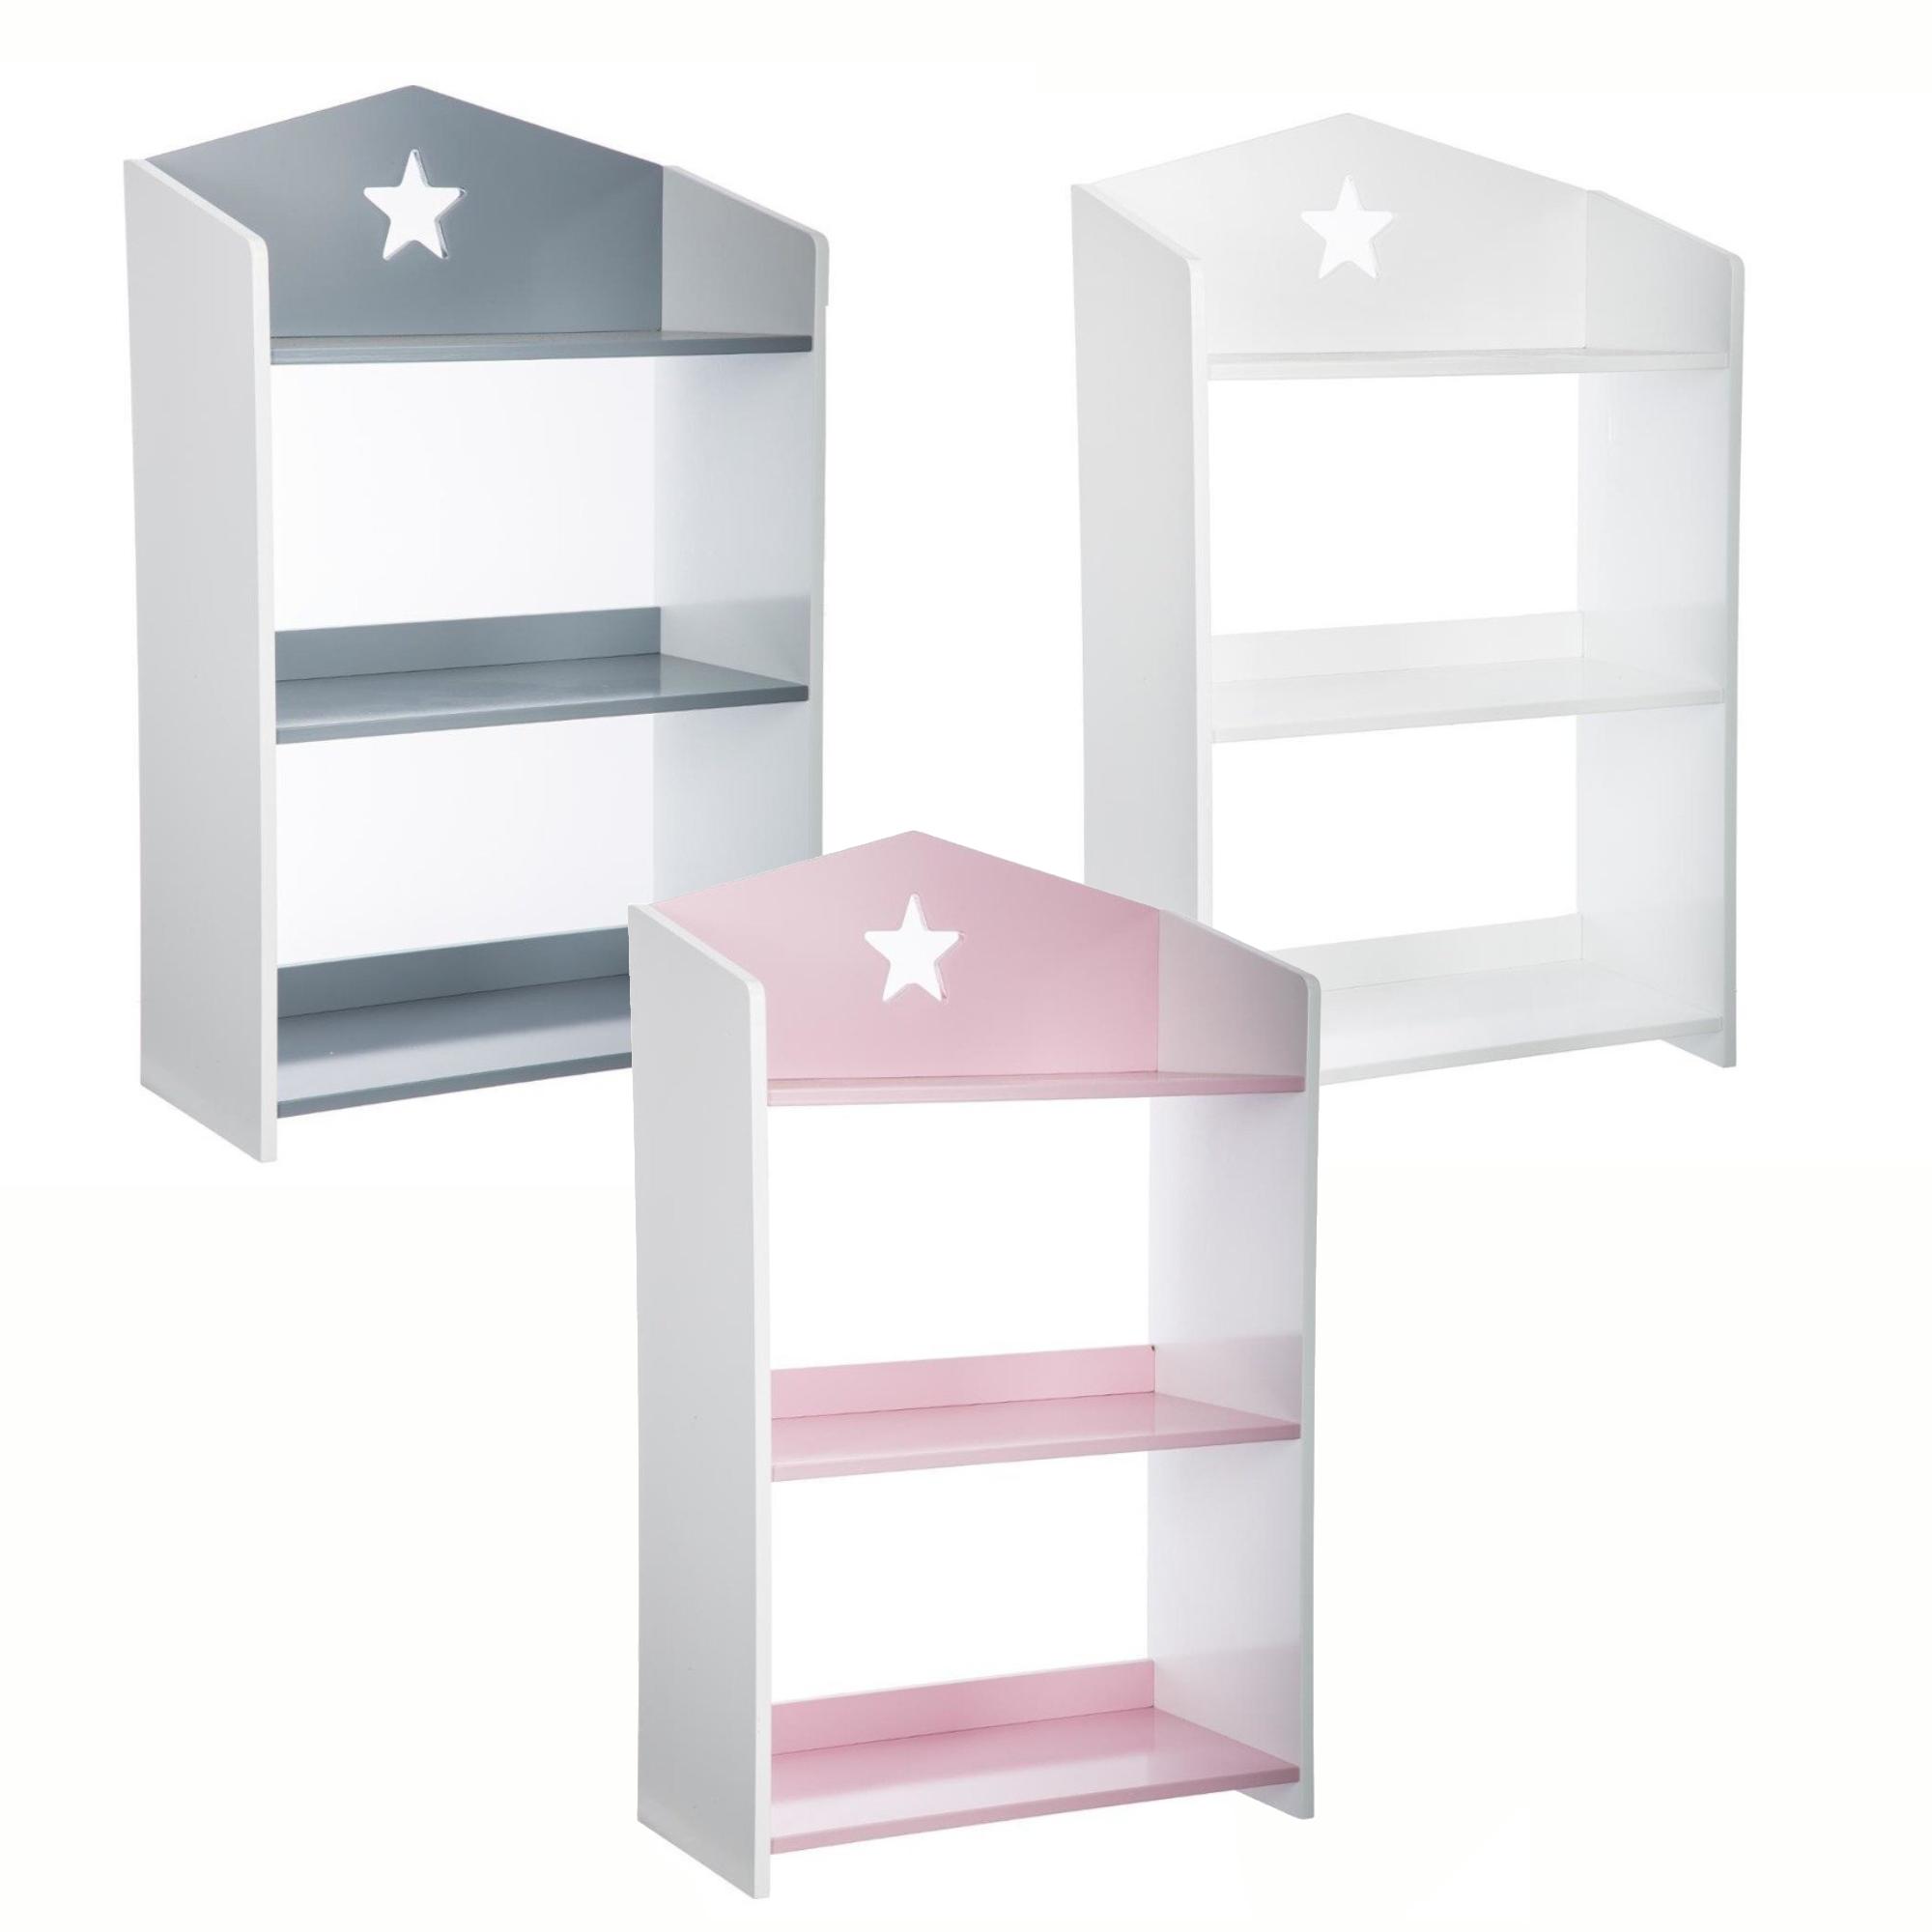 Details About 3 Tier Storage Shelf Bookcase Children Kids Furniture Shelving Unit Bookshelves